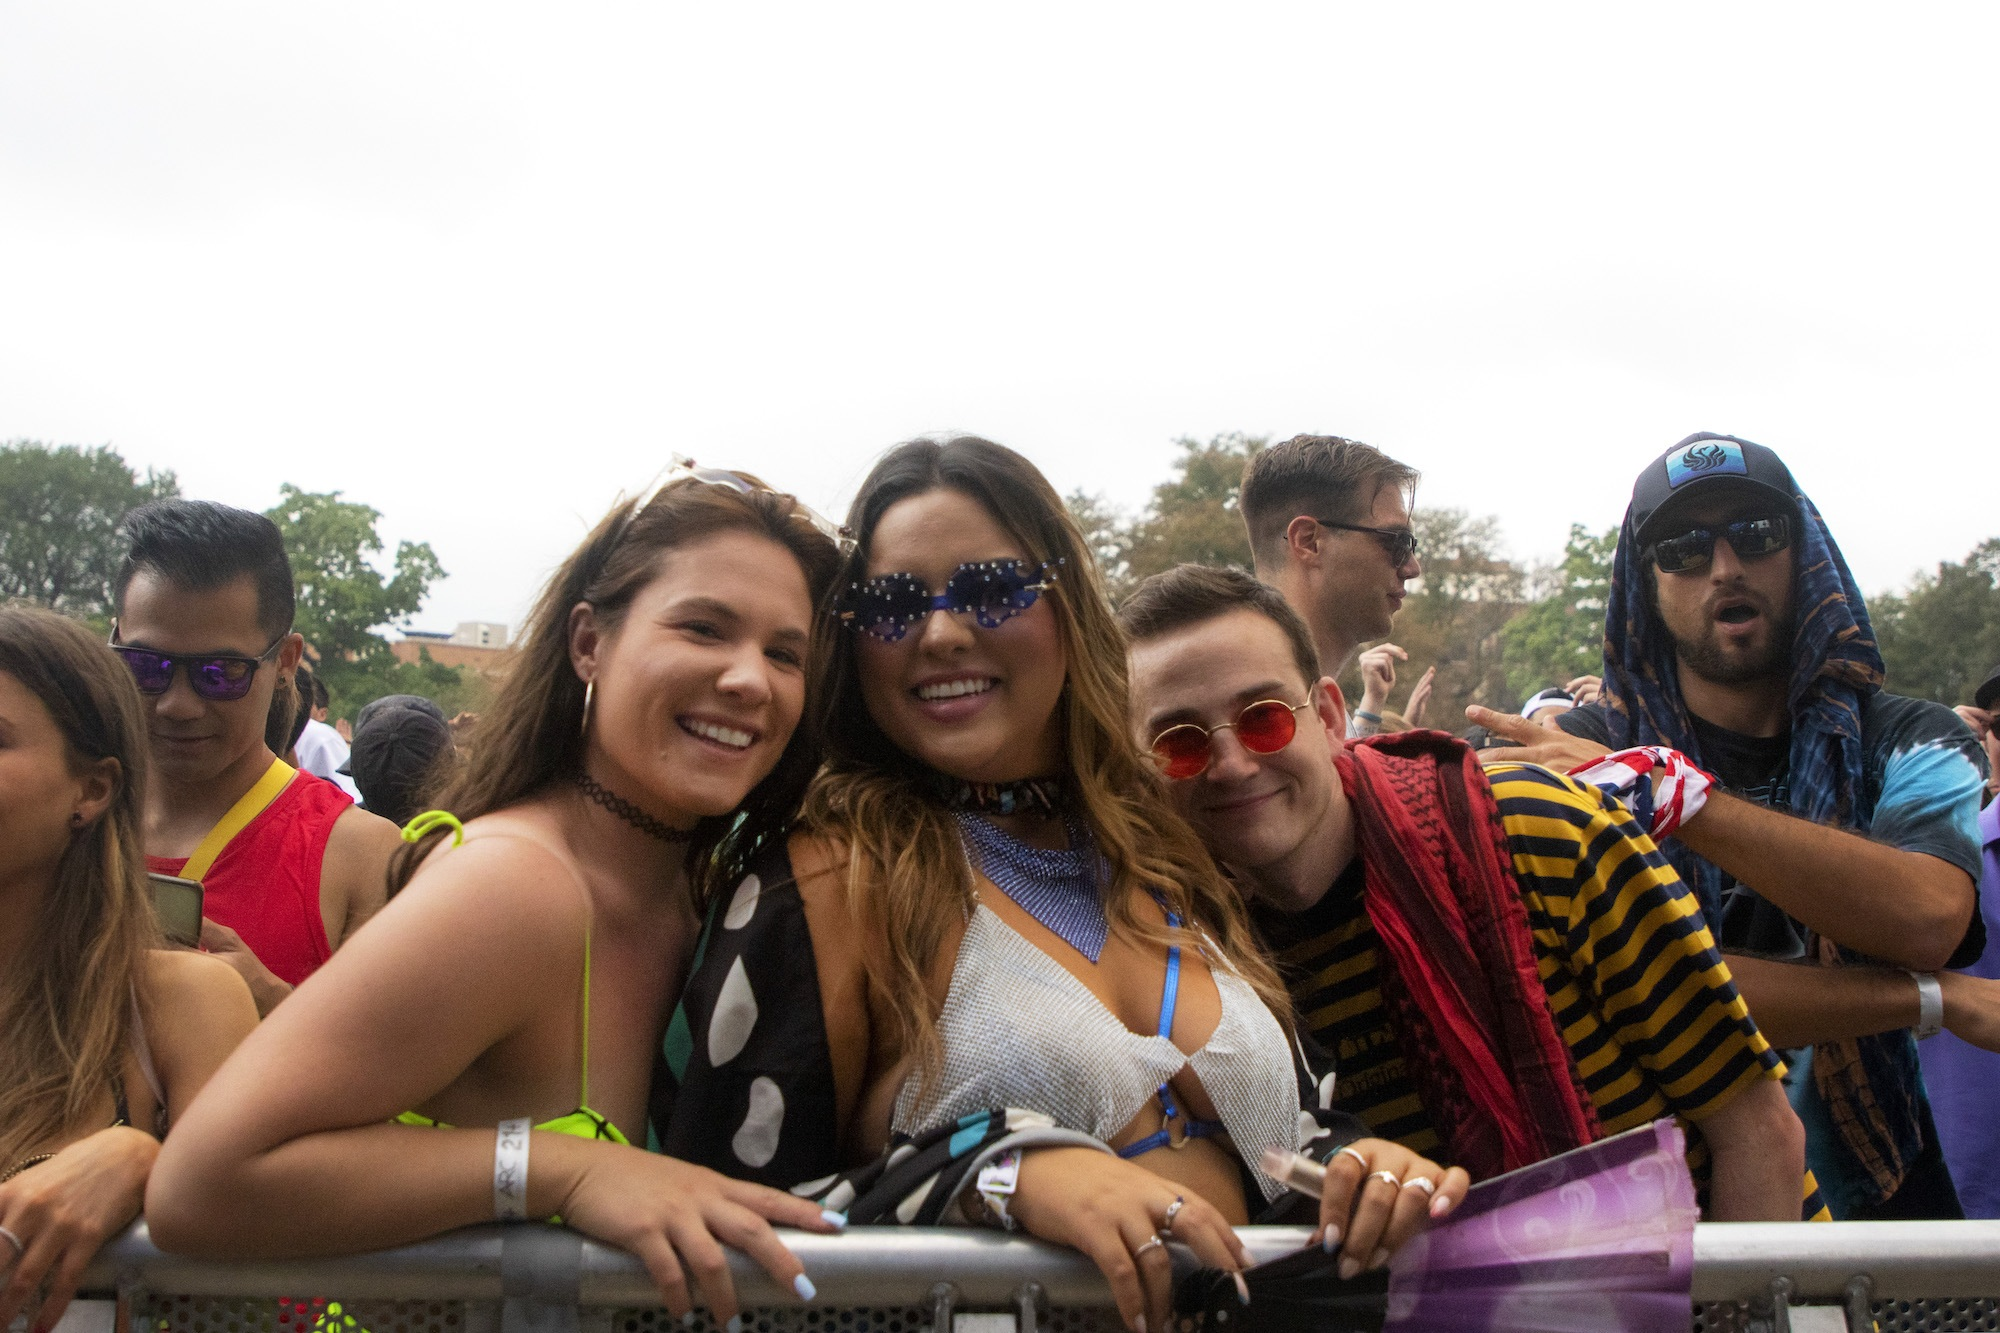 ARC Music Fest - Day 1 [GALLERY] 22